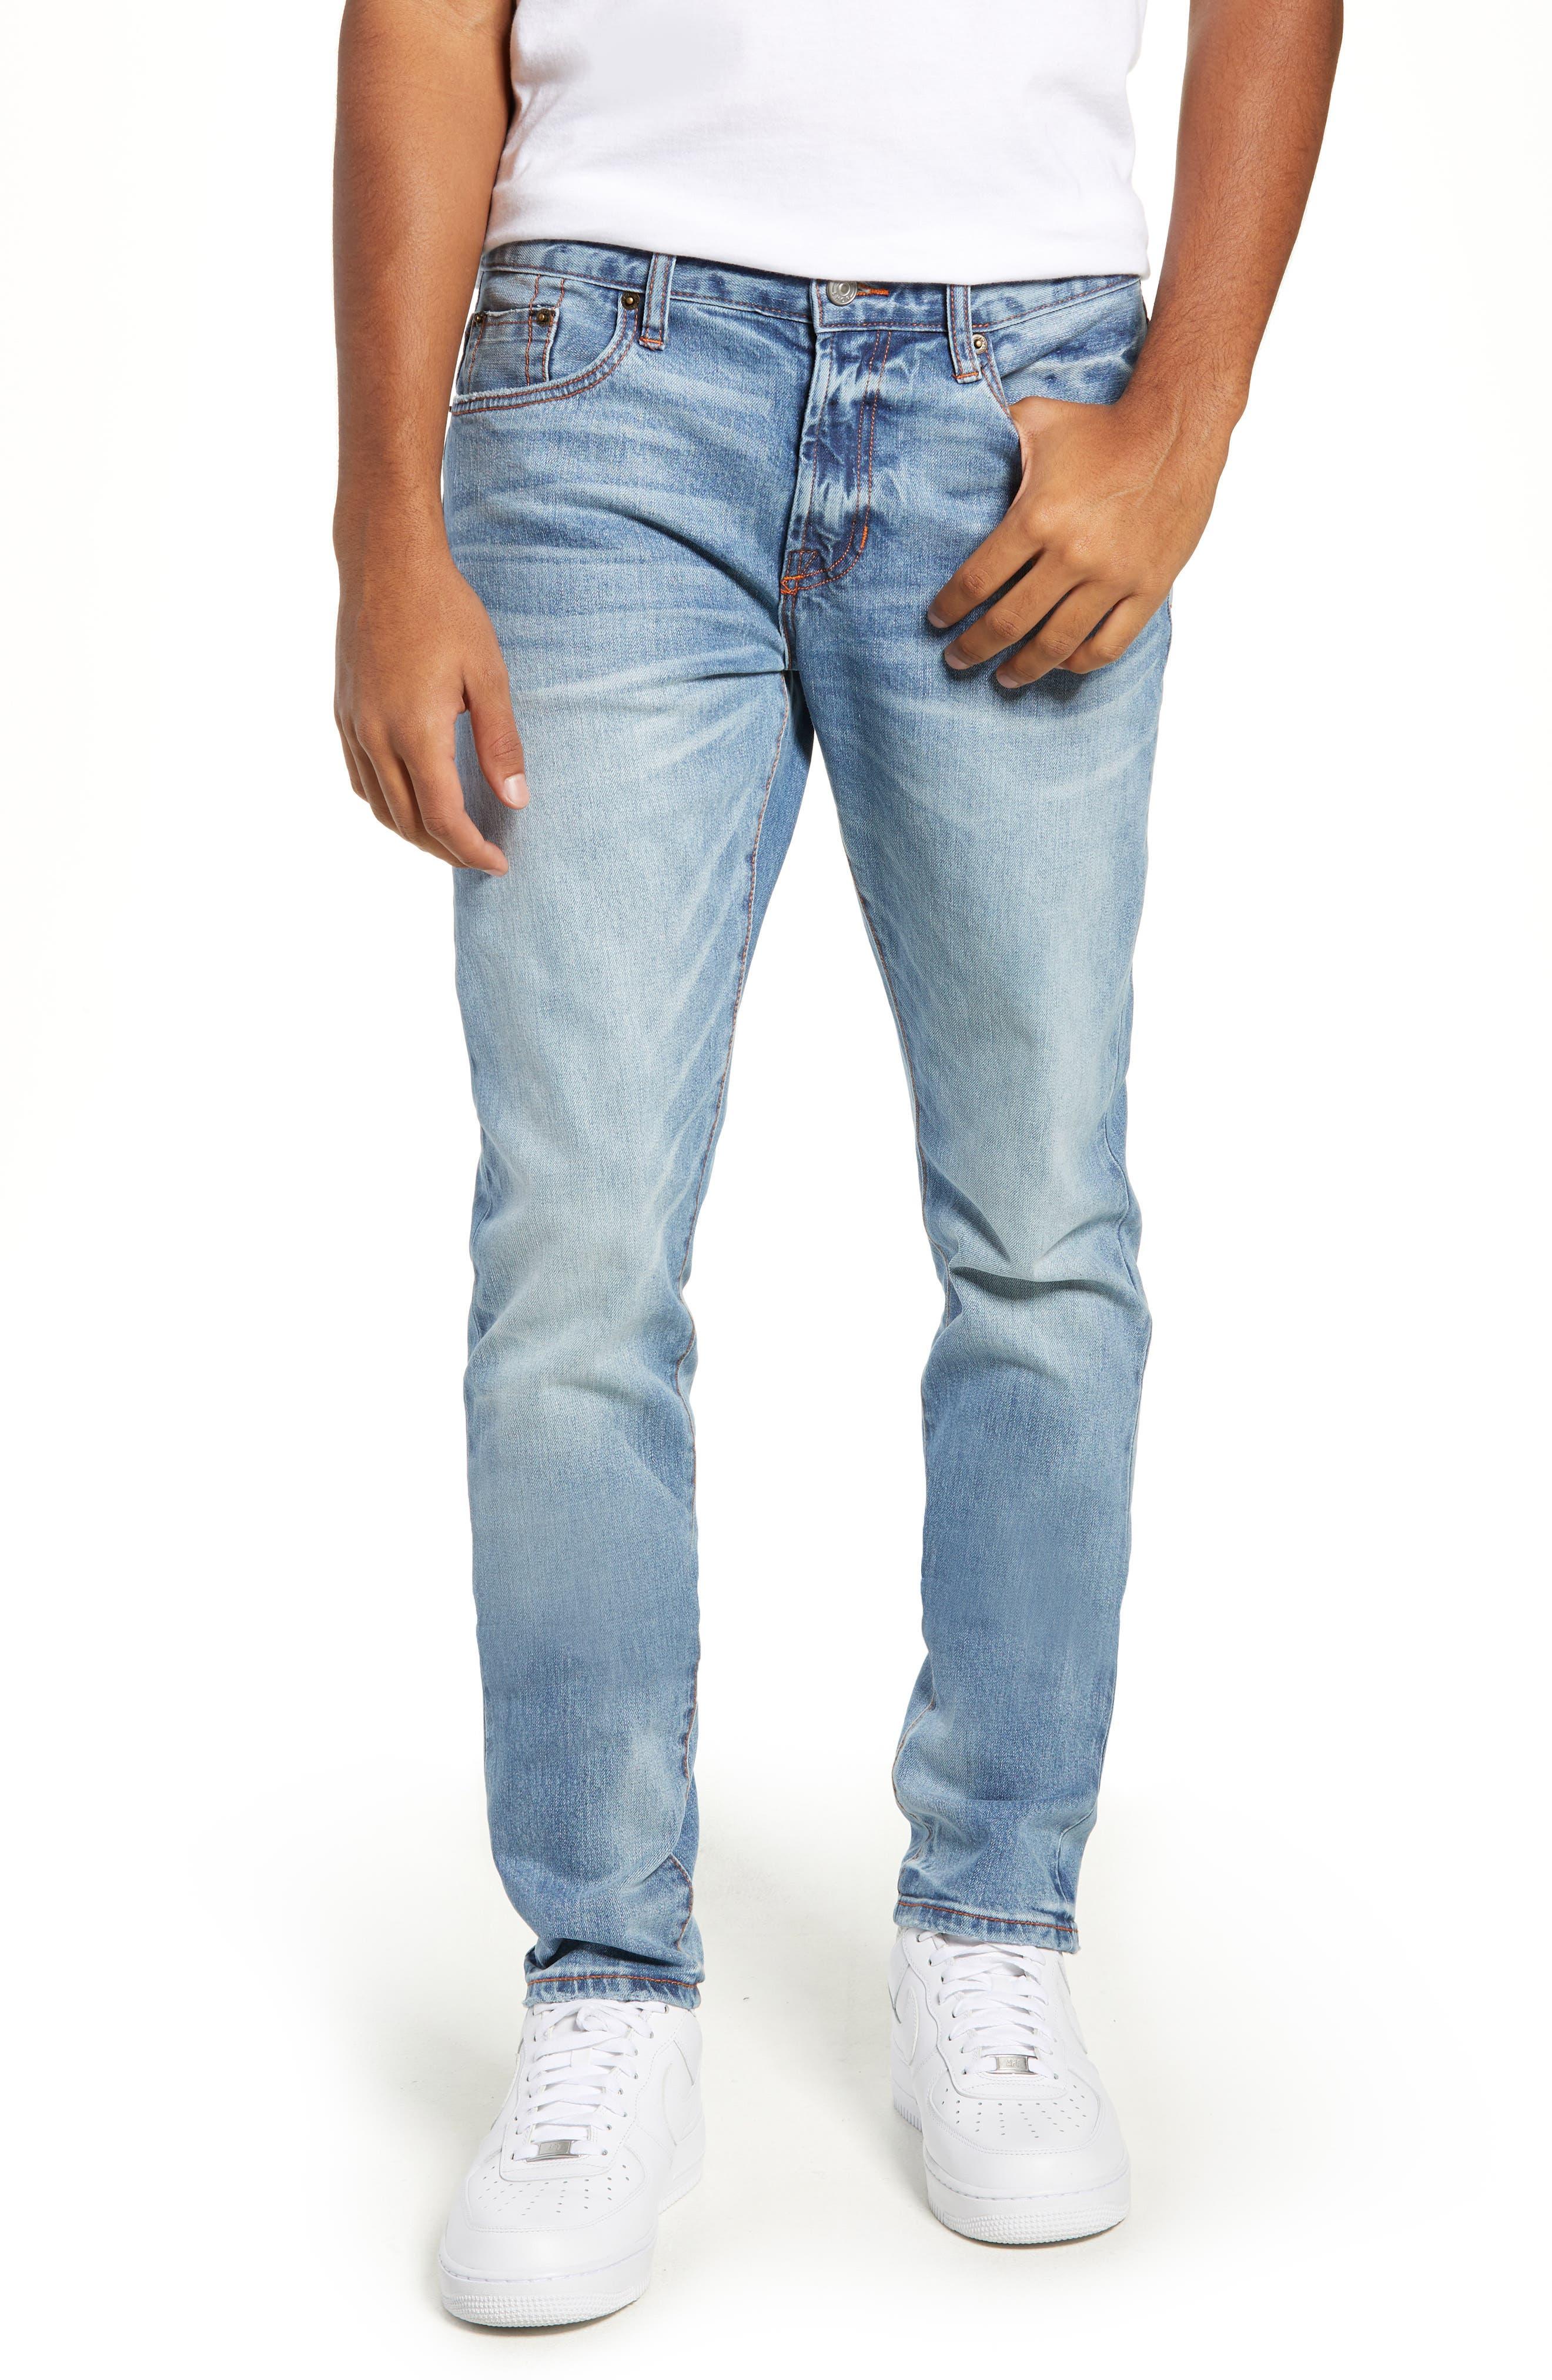 Jim Slim Fit Jeans,                             Main thumbnail 1, color,                             BROOME